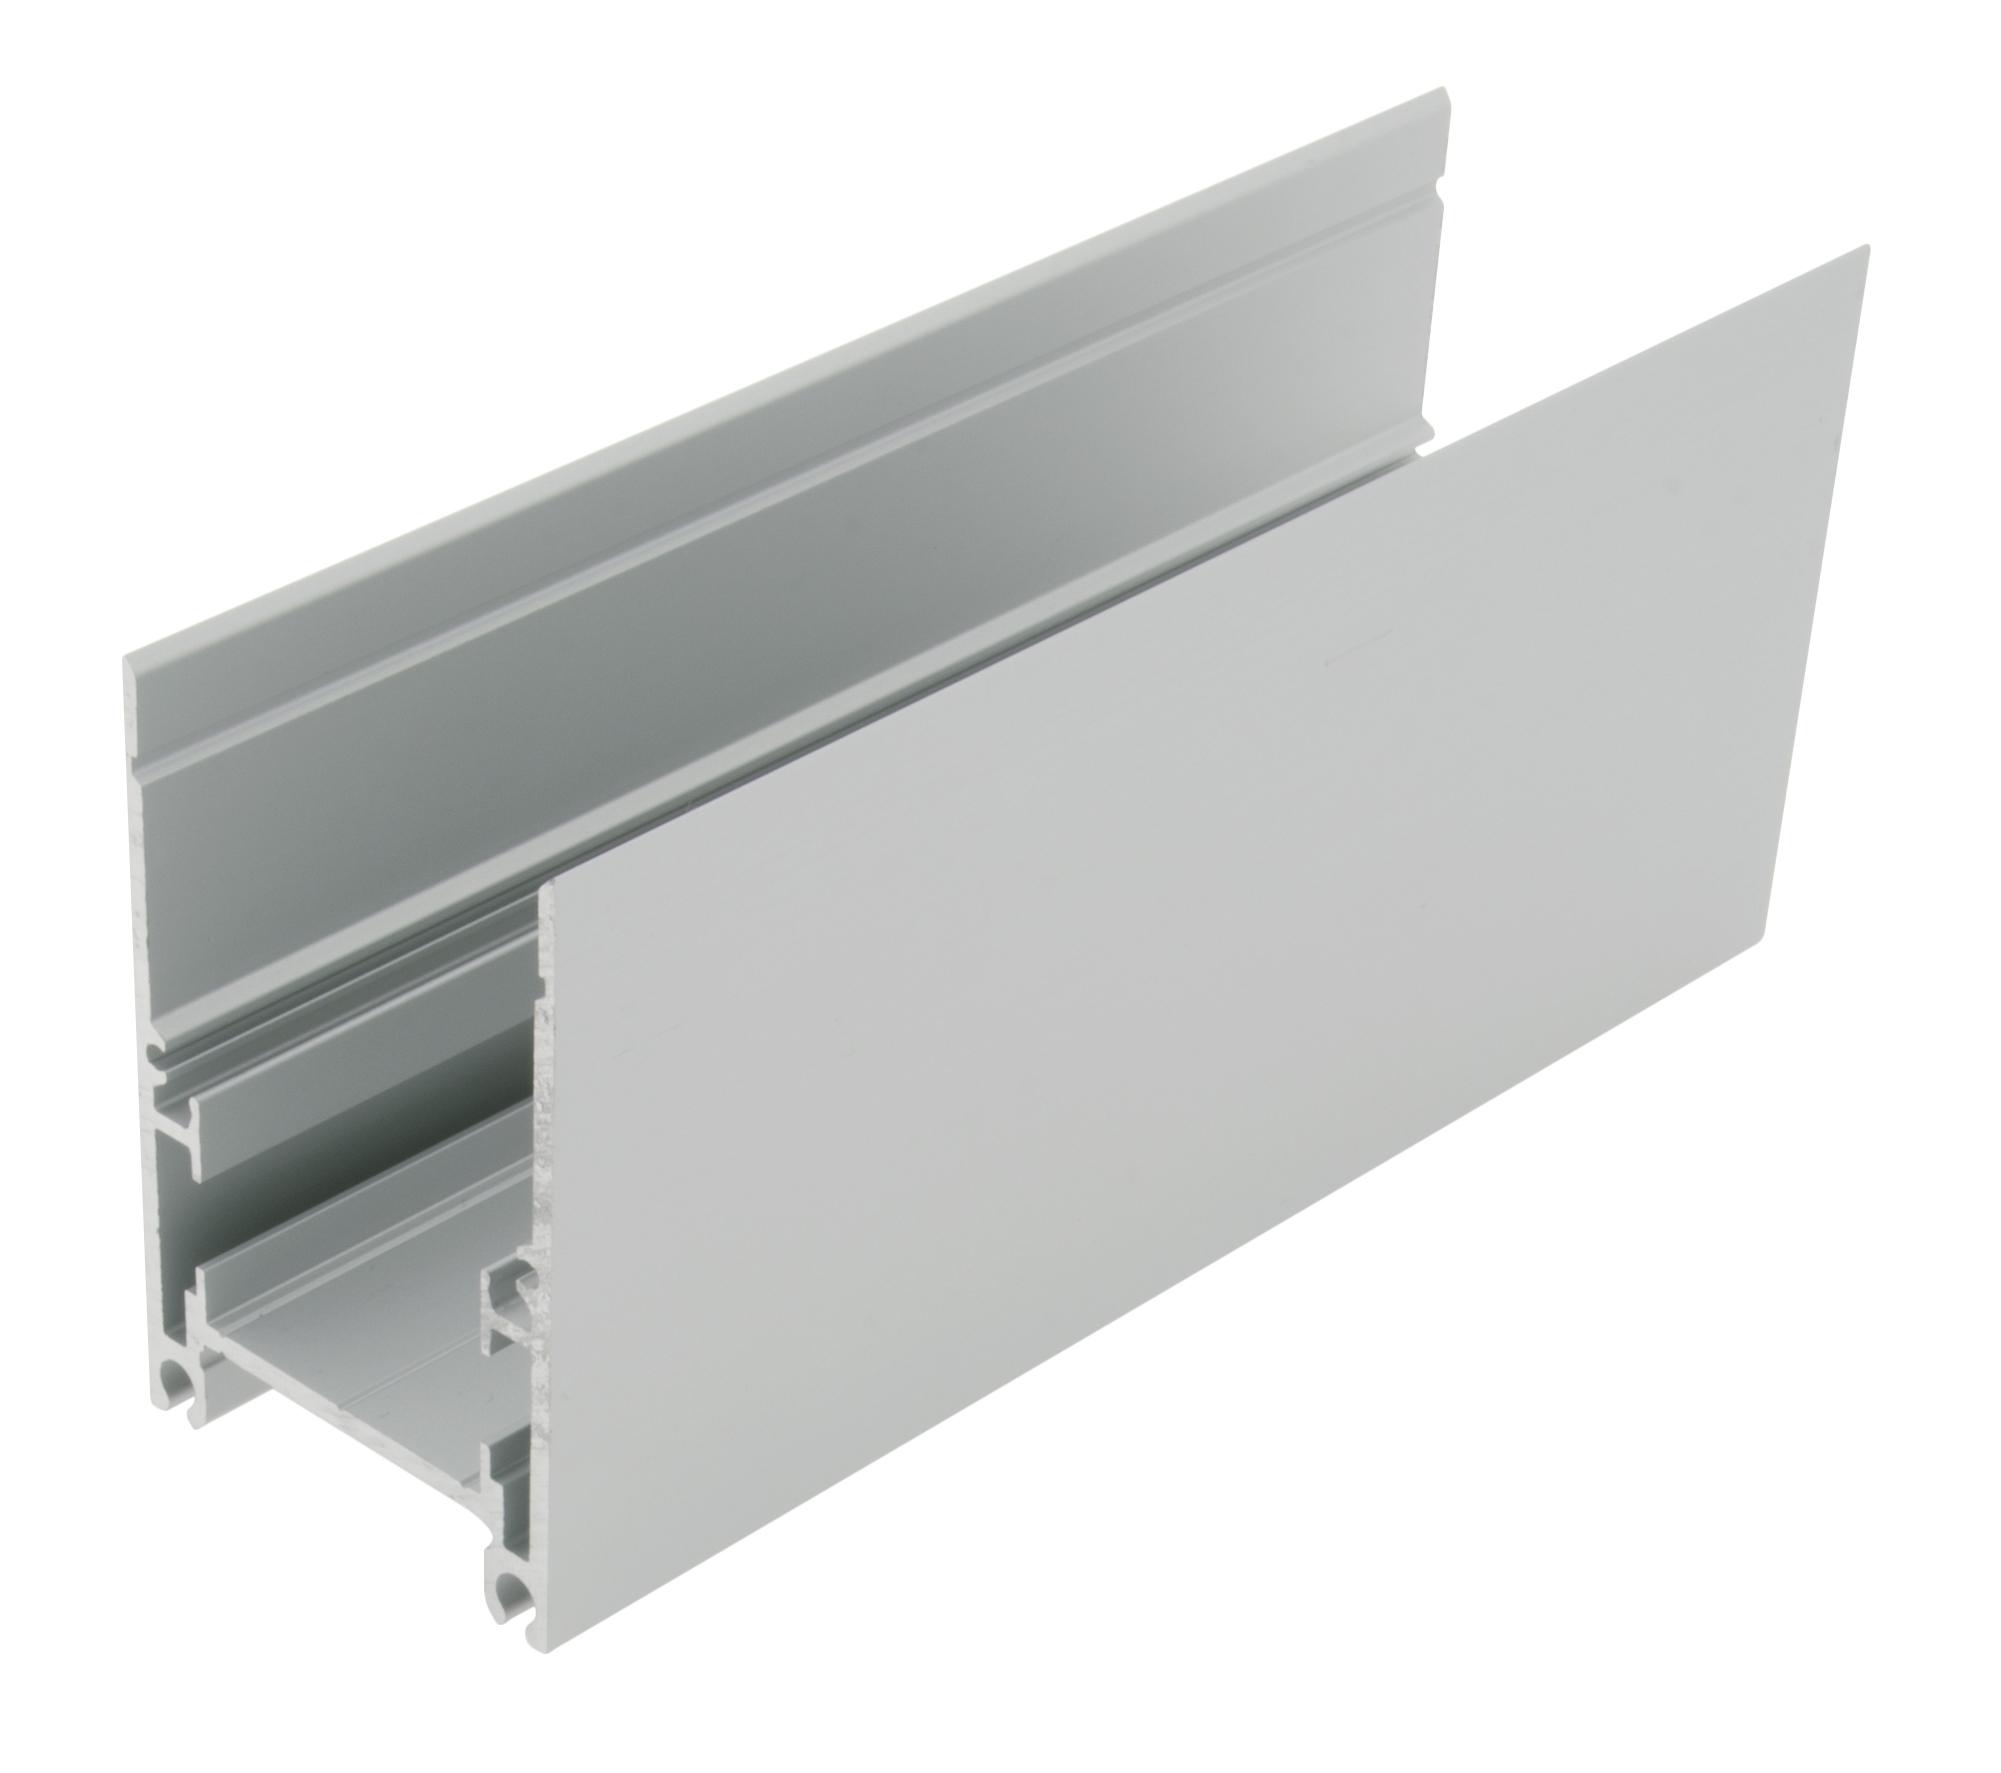 1 m Aluminium Profil MFH, 2m LIAP005002